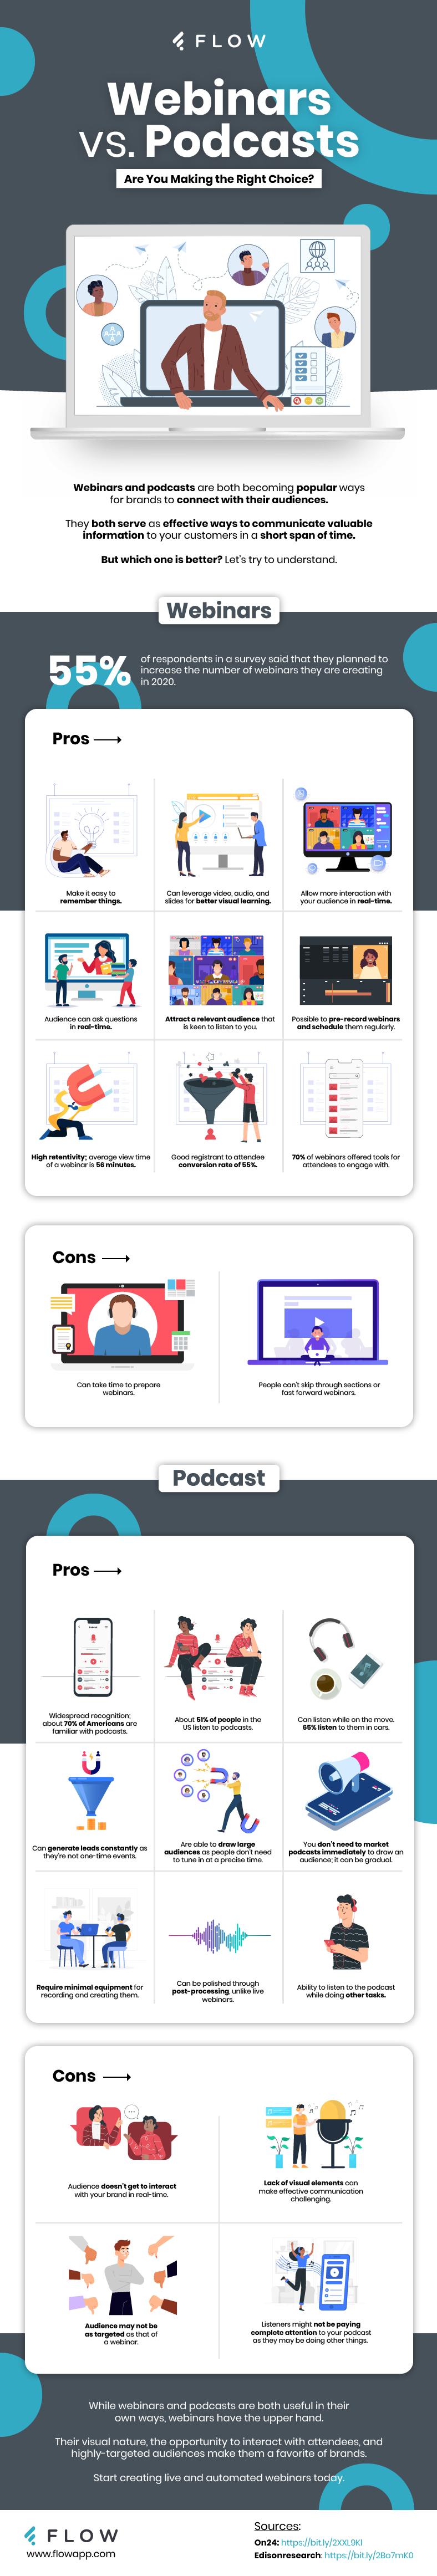 Infographic: Webinars vs Podcasts